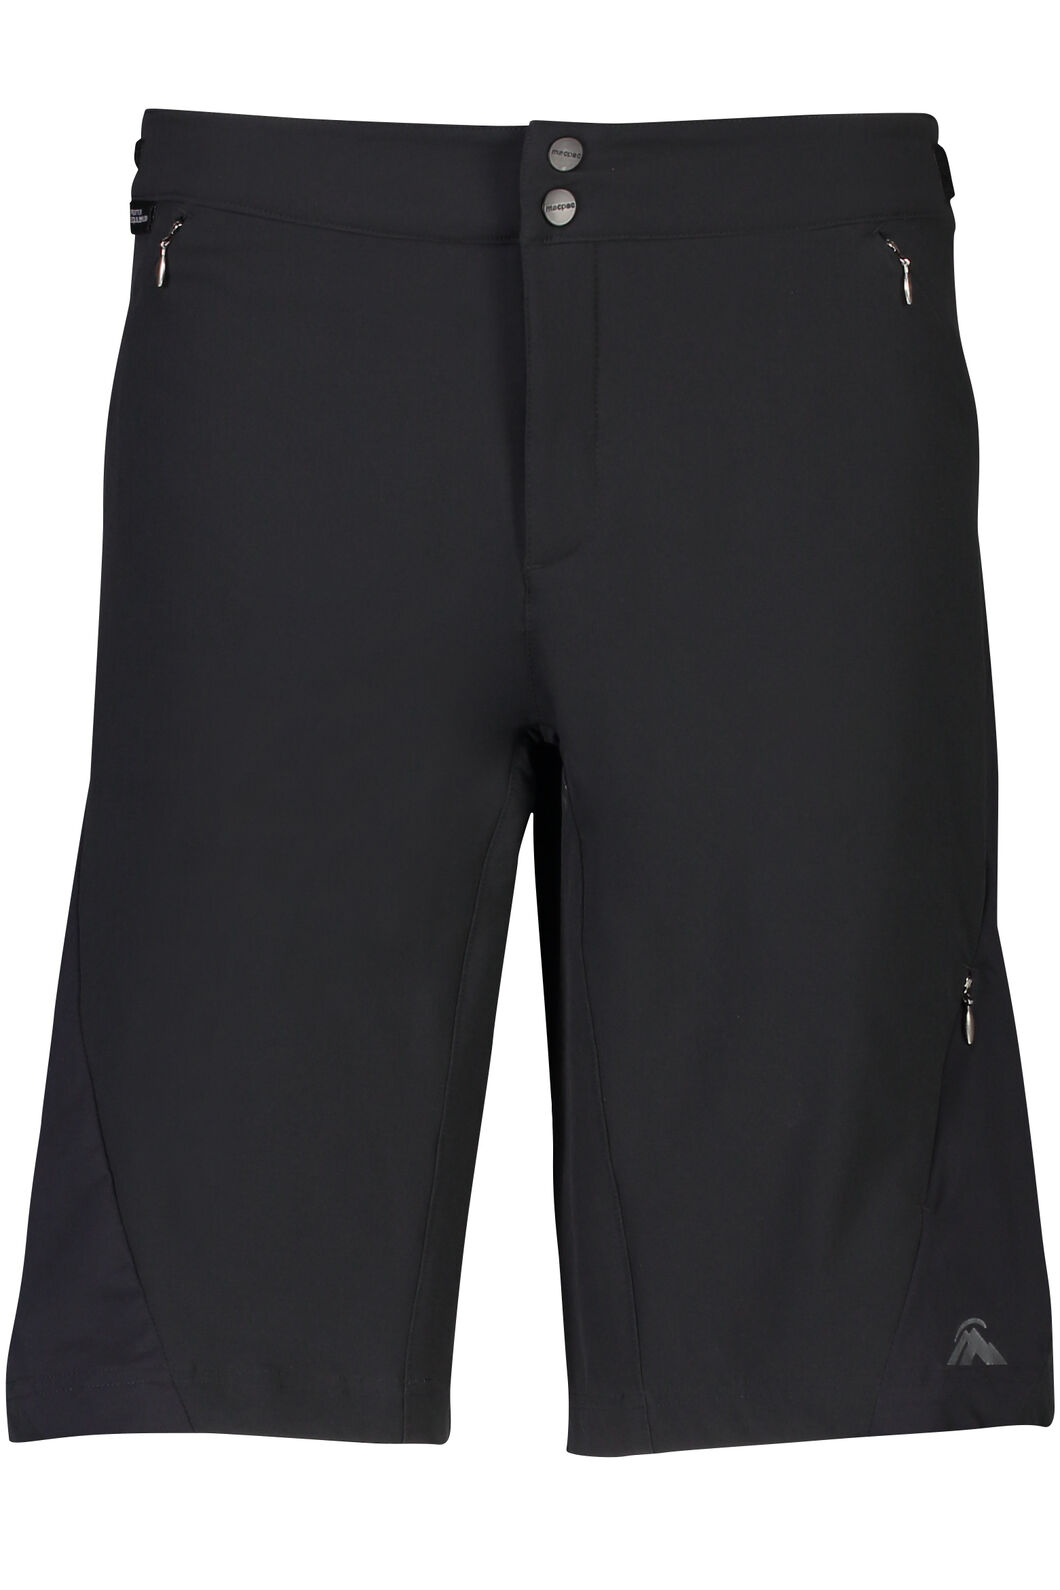 Macpac Stretch Pertex Equilibrium® Mountain Bike Shorts - Women's, Black, hi-res